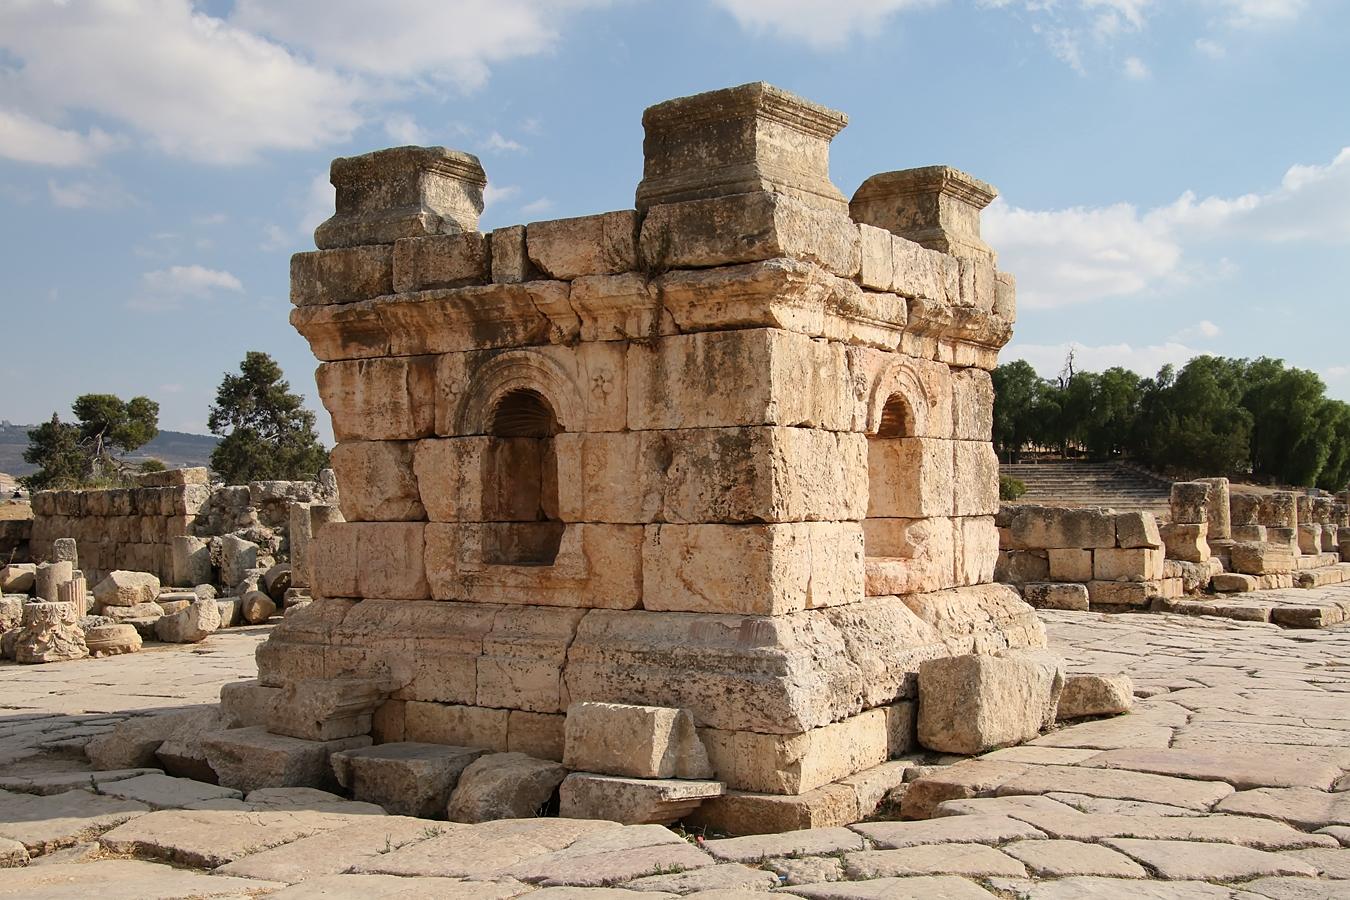 Tetrapylon, de rotonde in de oudheid